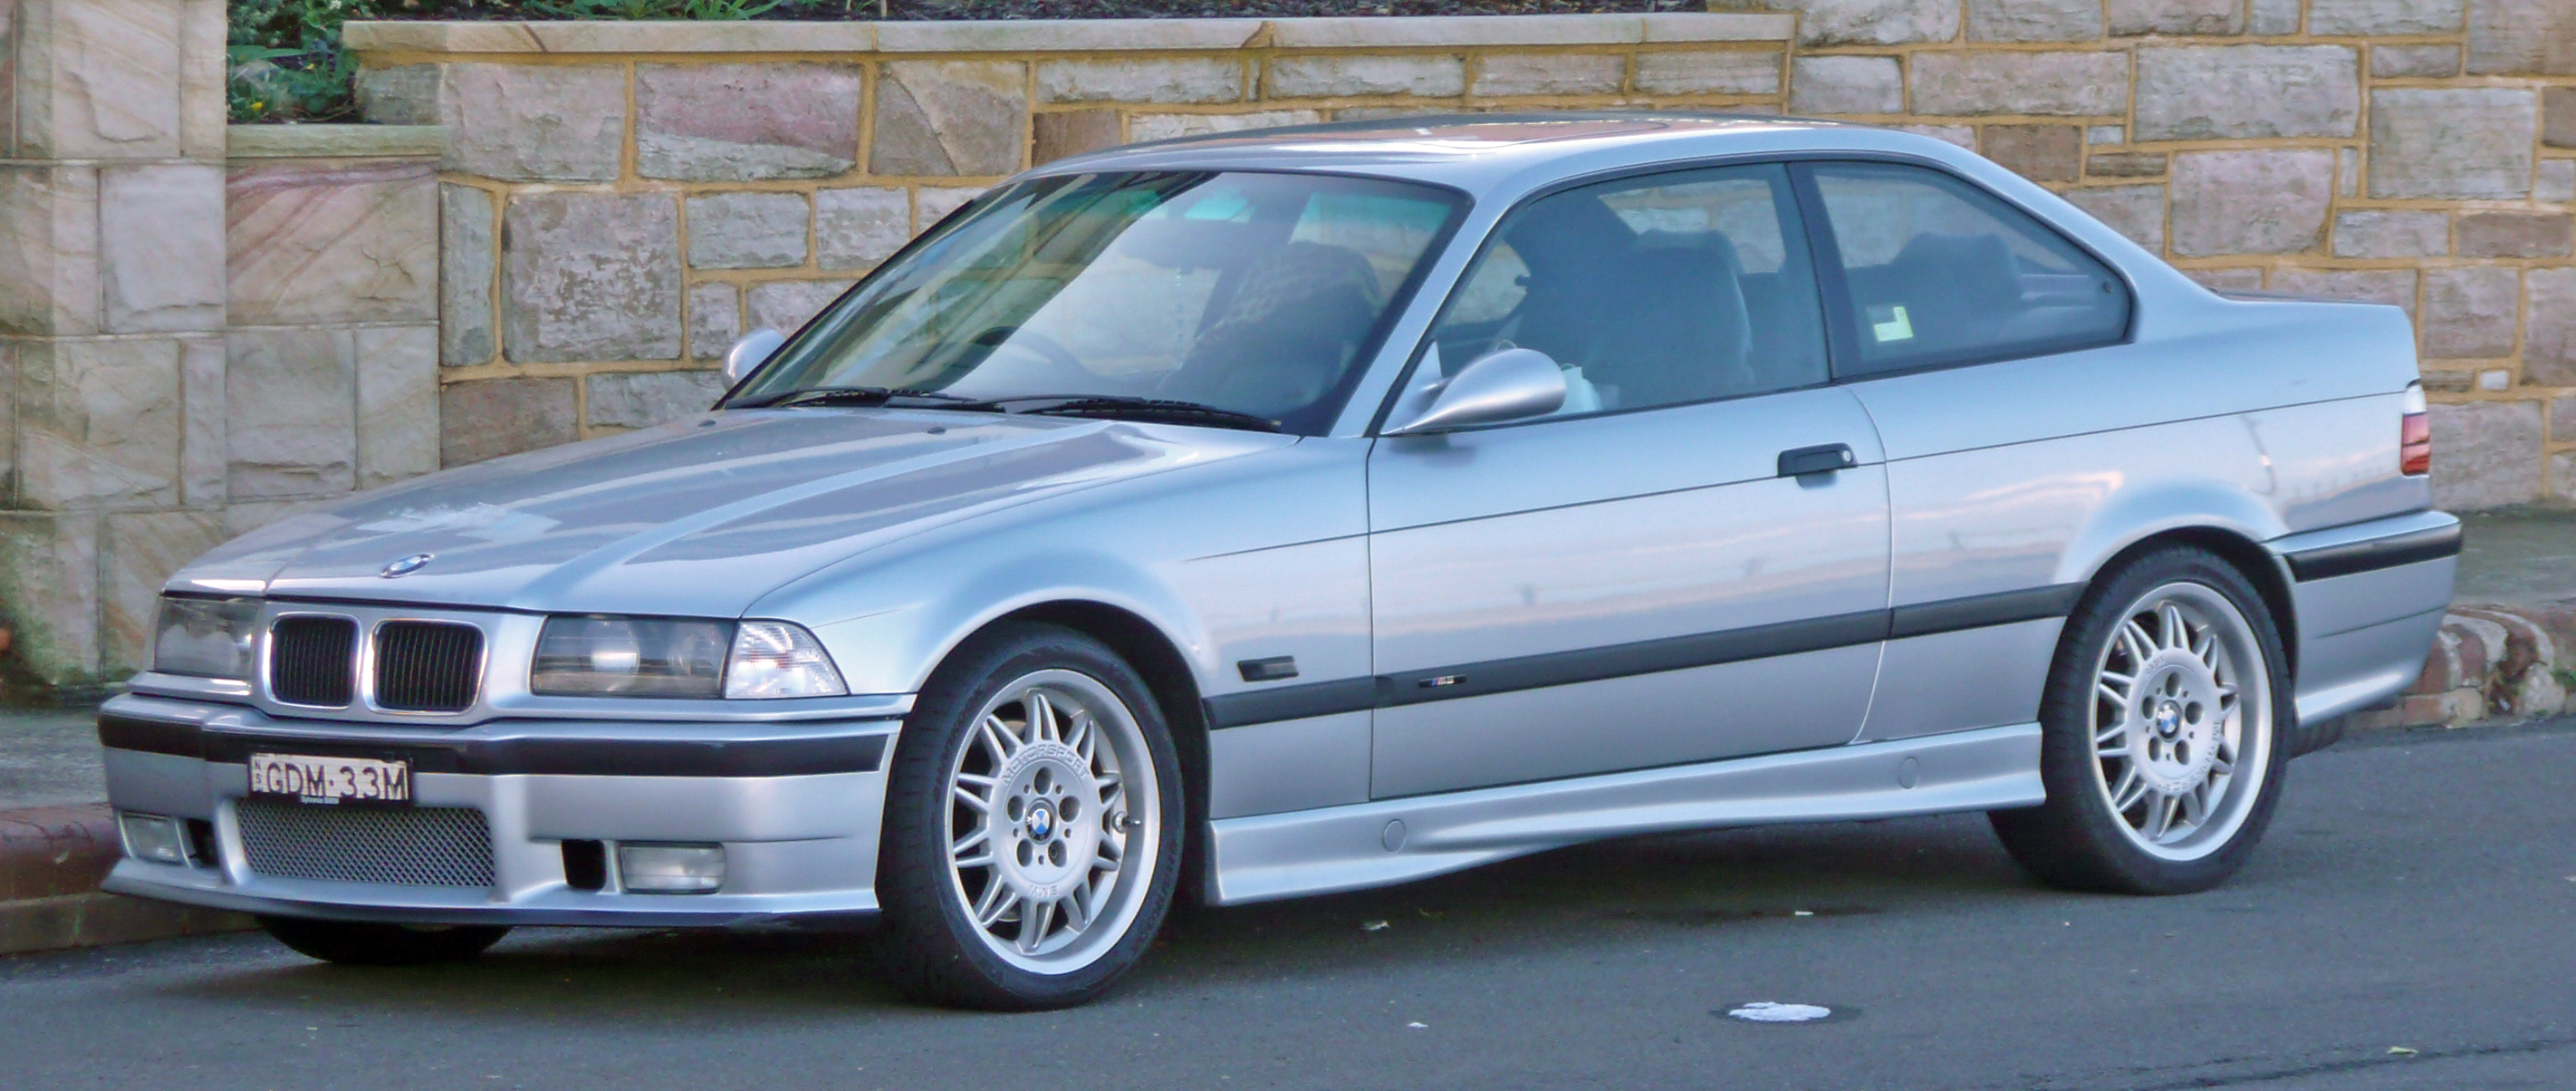 BMW M3 II (E36) 1992 - 1999 Sedan #3